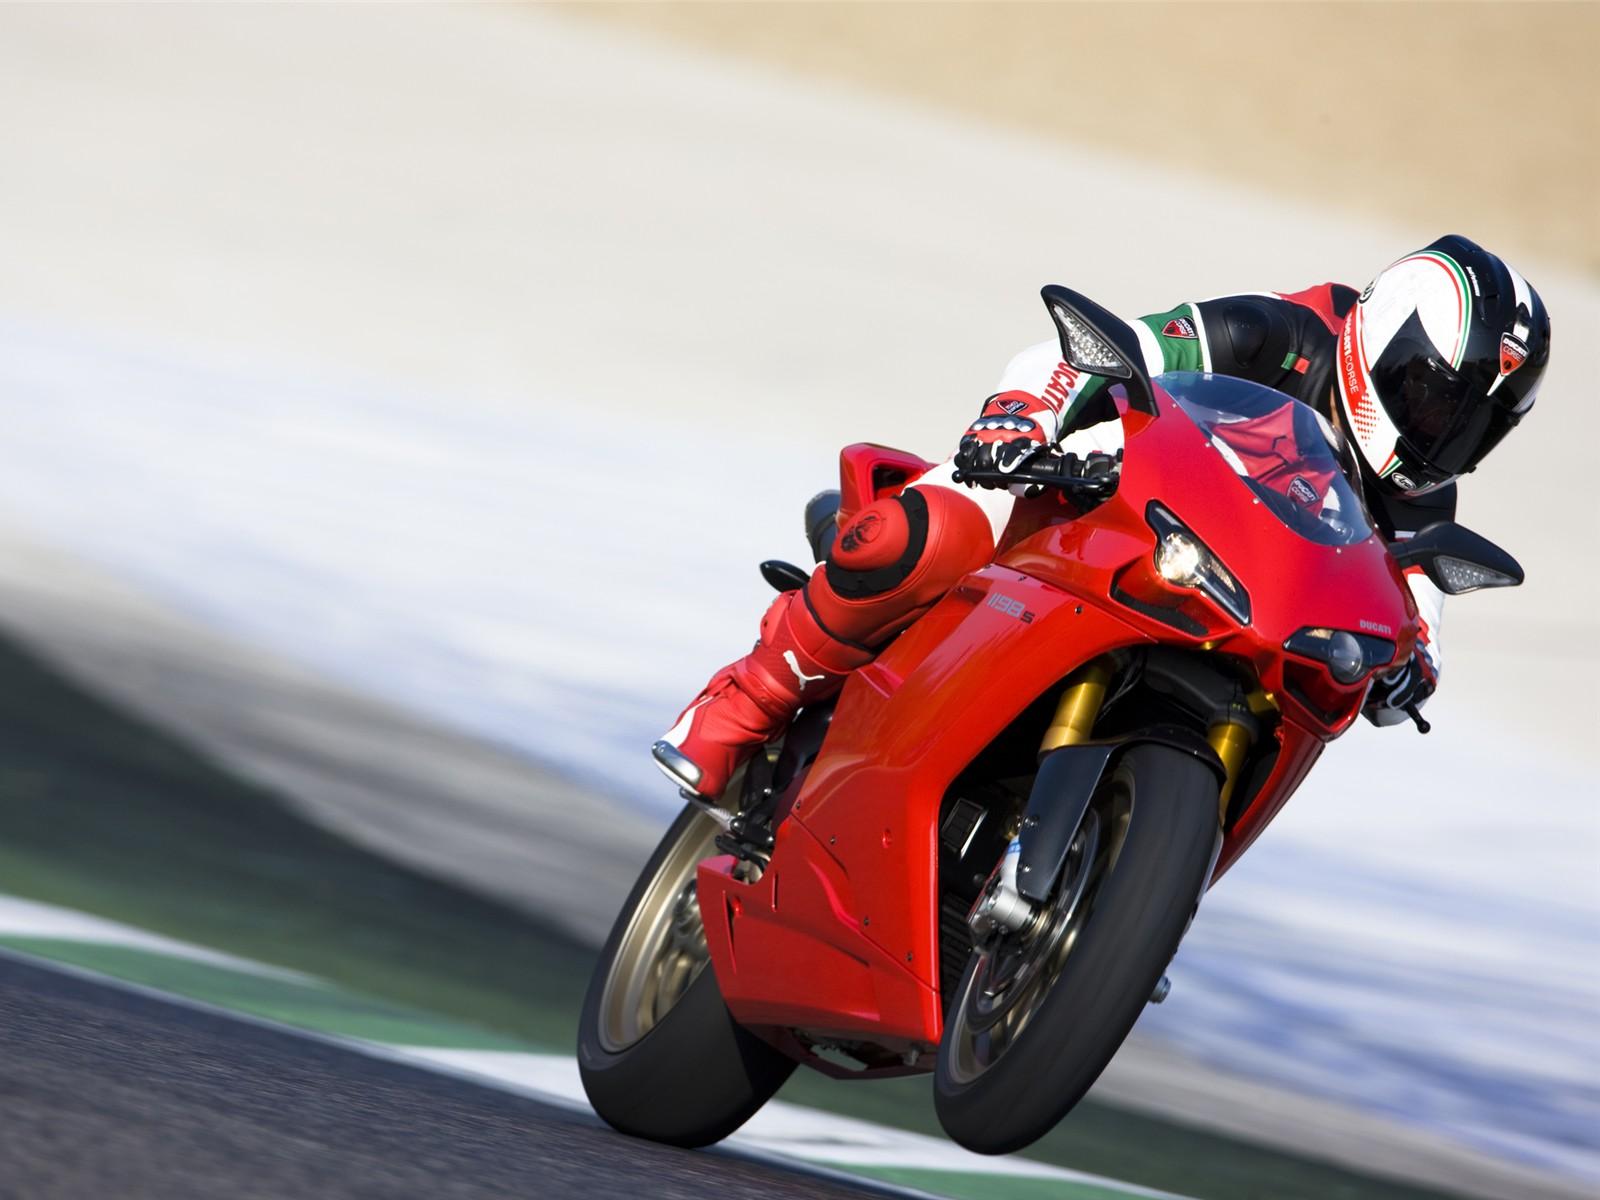 Free Download Ducati 1198 Race Wallpapers Hd Wallpapers